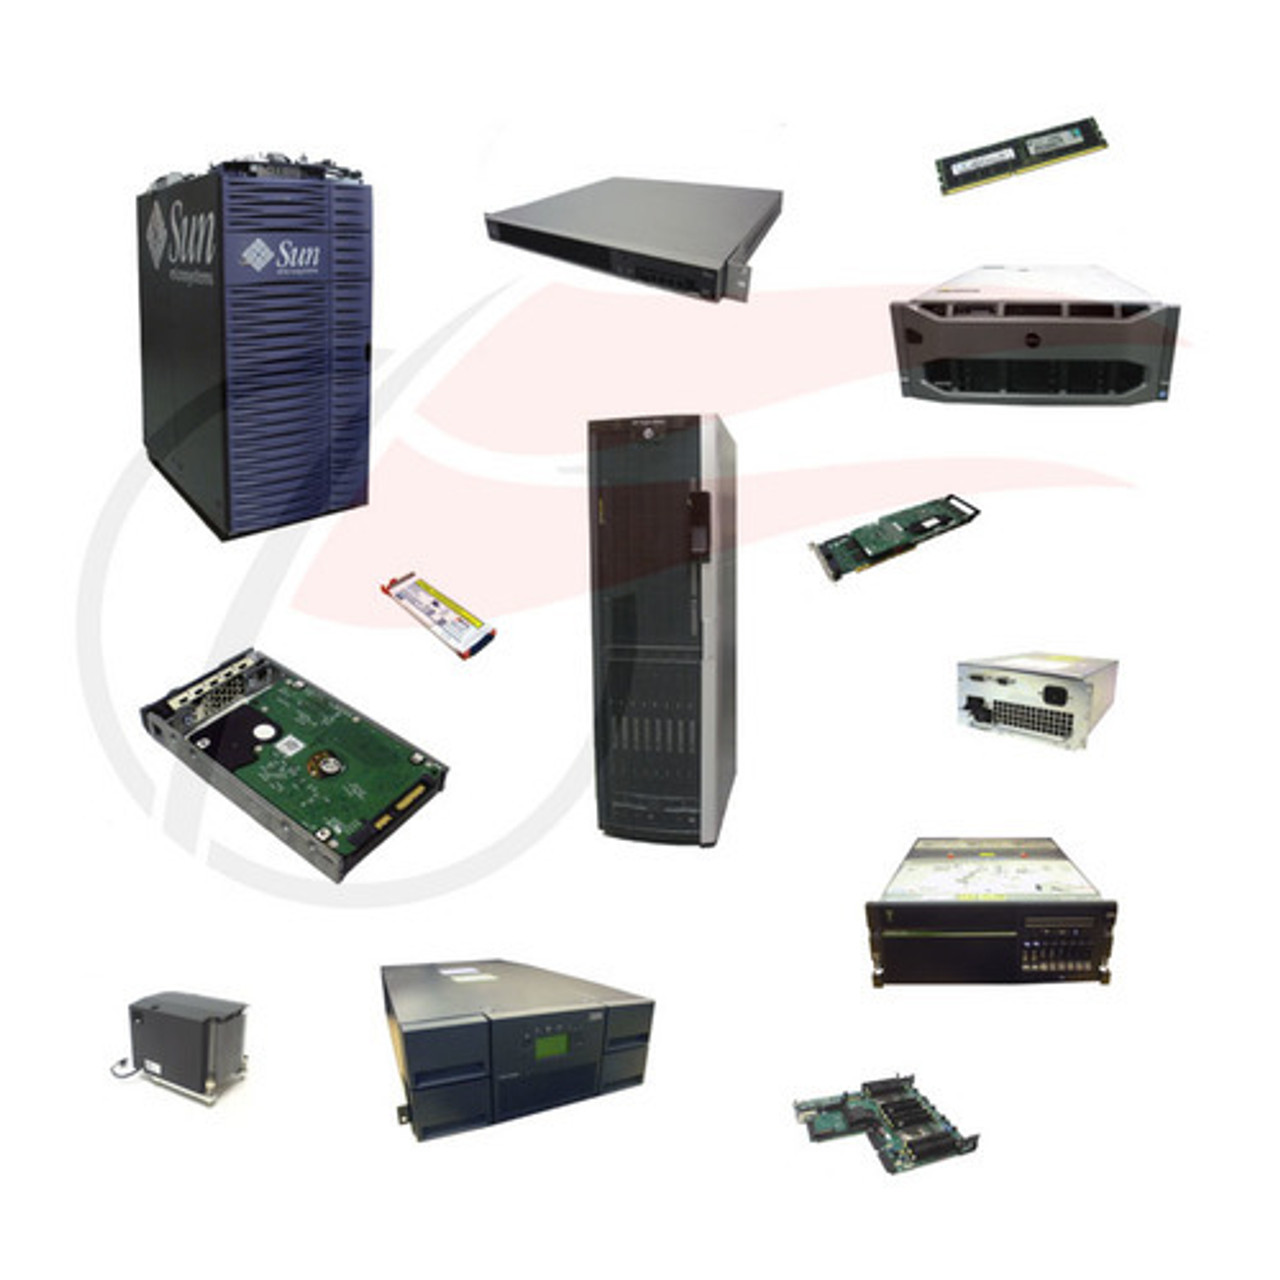 HP Integrity rx1600 Servers